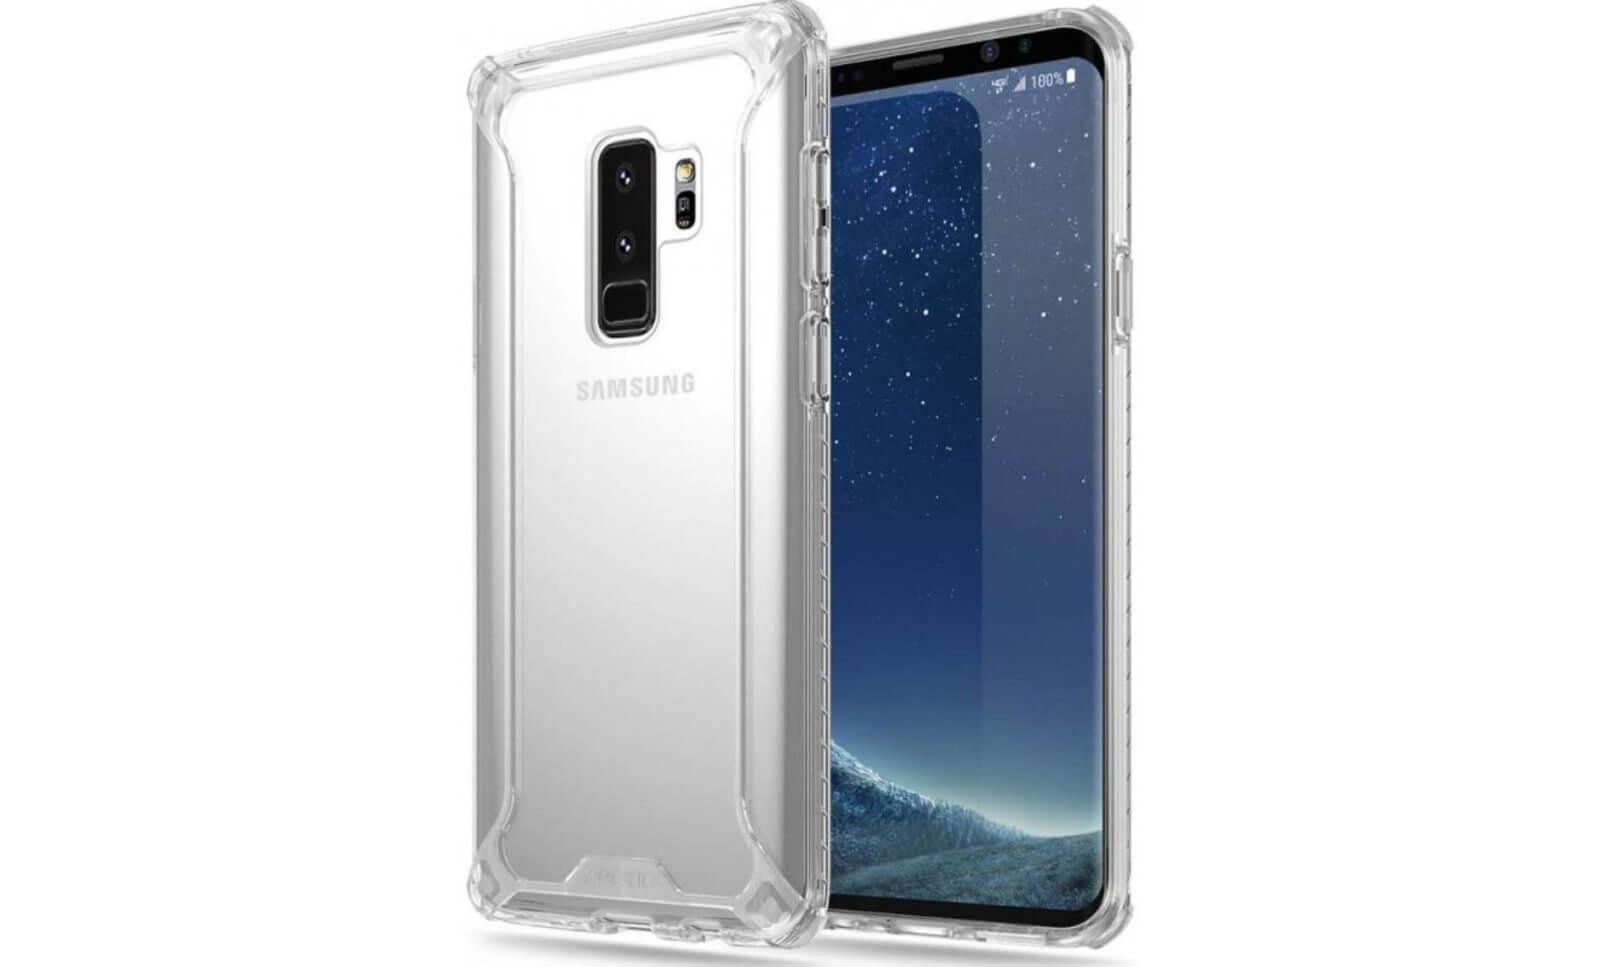 Samsung Galaxy S9 Plus Case GSMArena 6 Widened 1600x967 - Samsung Galaxy S9: tudo o que já sabemos